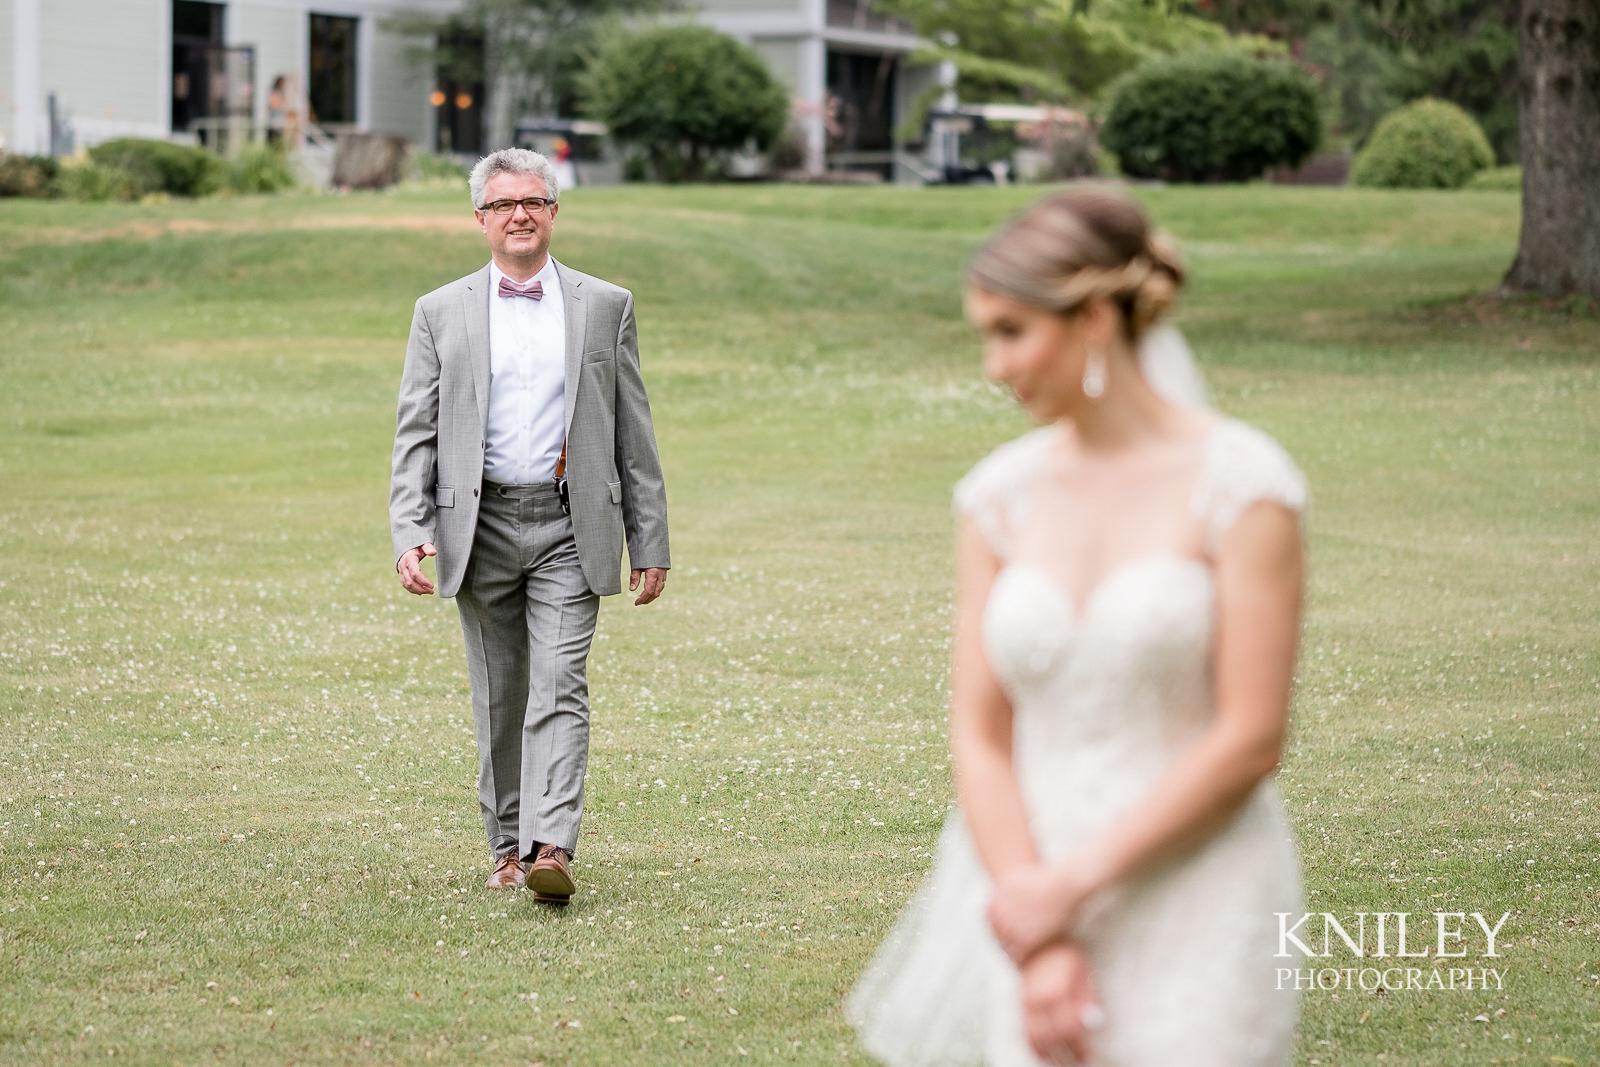 019 - Ontario Golf Club Wedding Pictures - XT2A6498.jpg